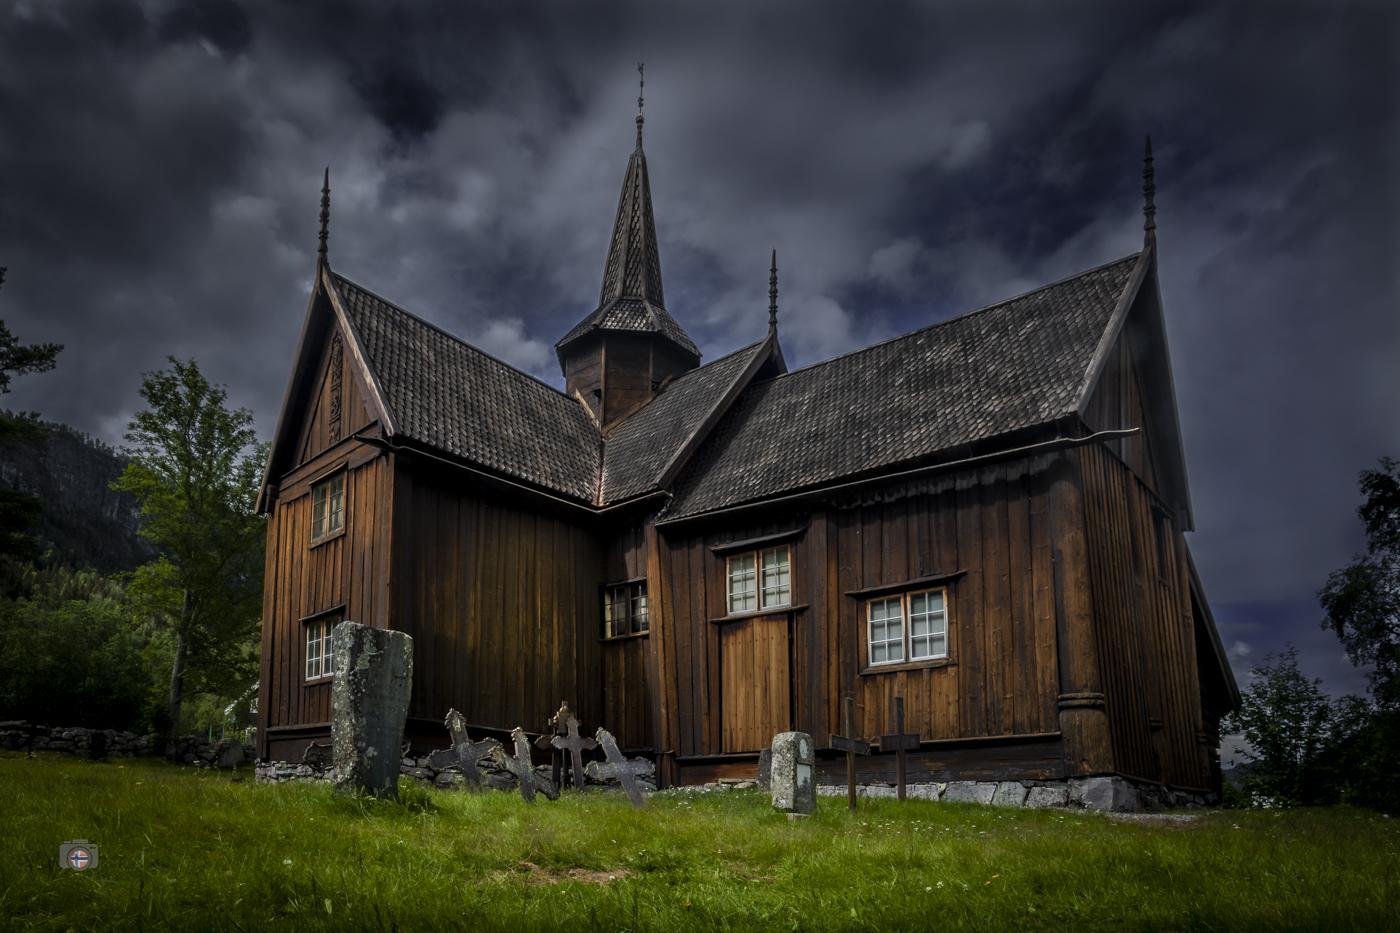 Nore Stabkirche